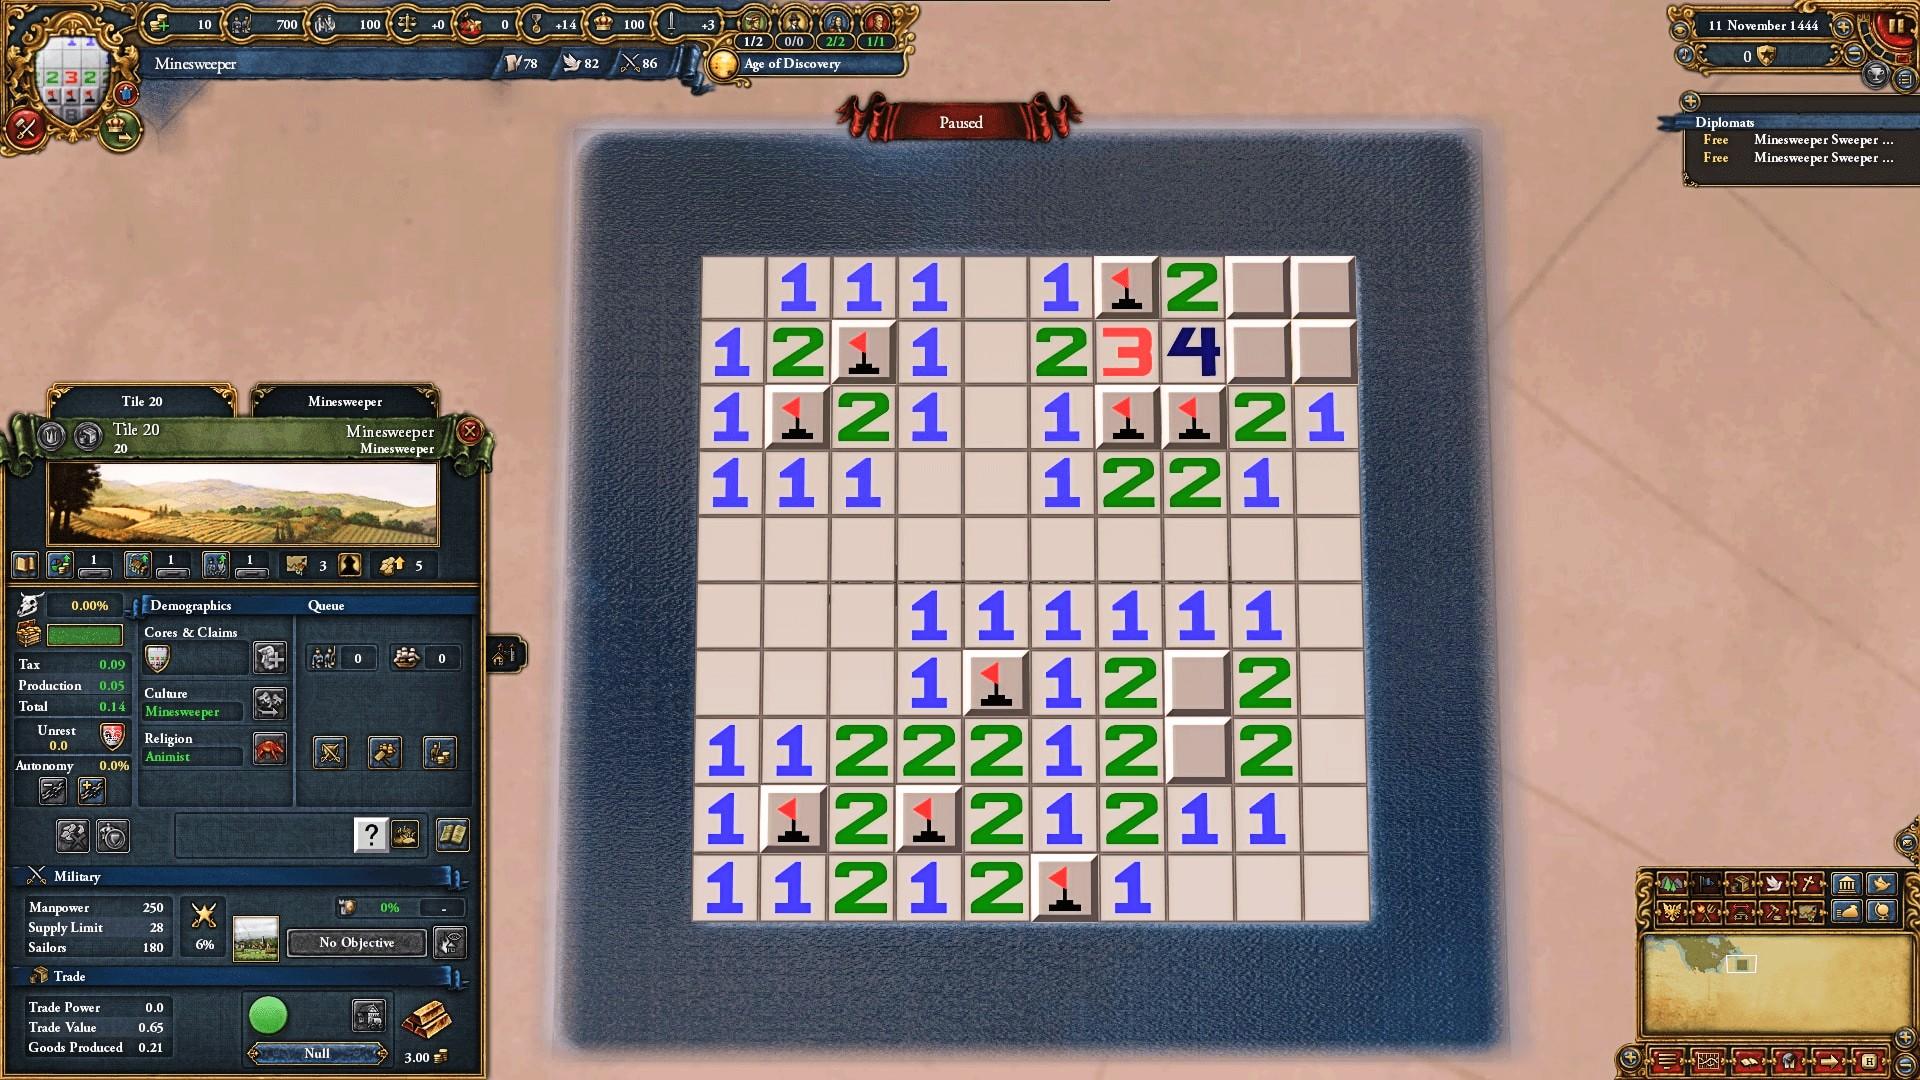 Europa Universalis IV now has Minesweeper